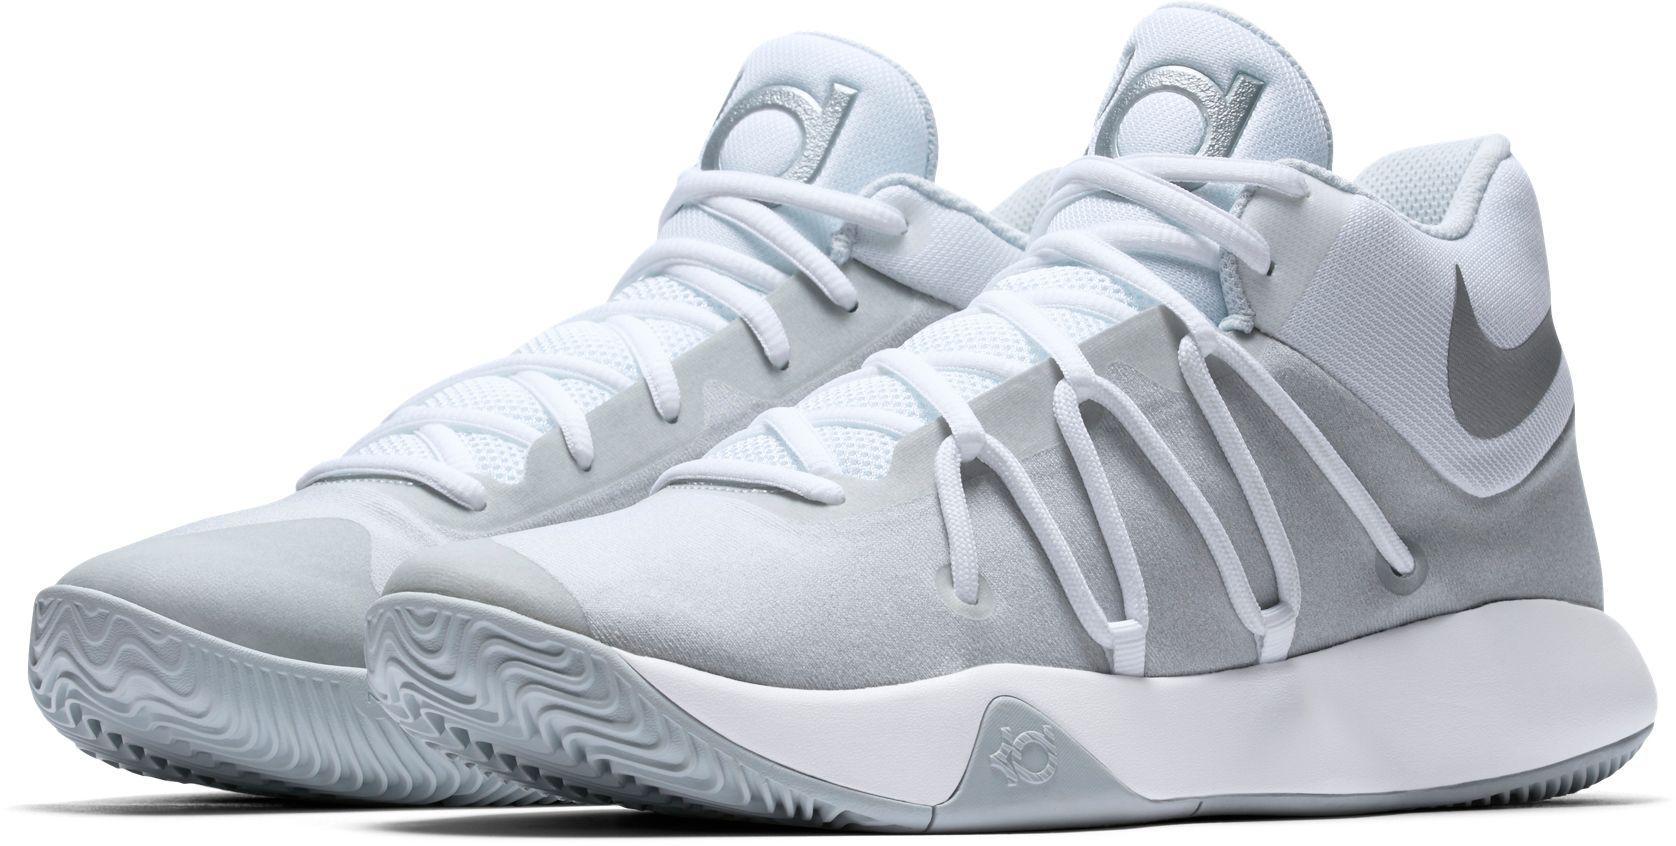 48ab0e3a333 ... buy online 1dd13 cb69e Nike - Gray Kd Trey 5 V Basketball Shoes for Men  -